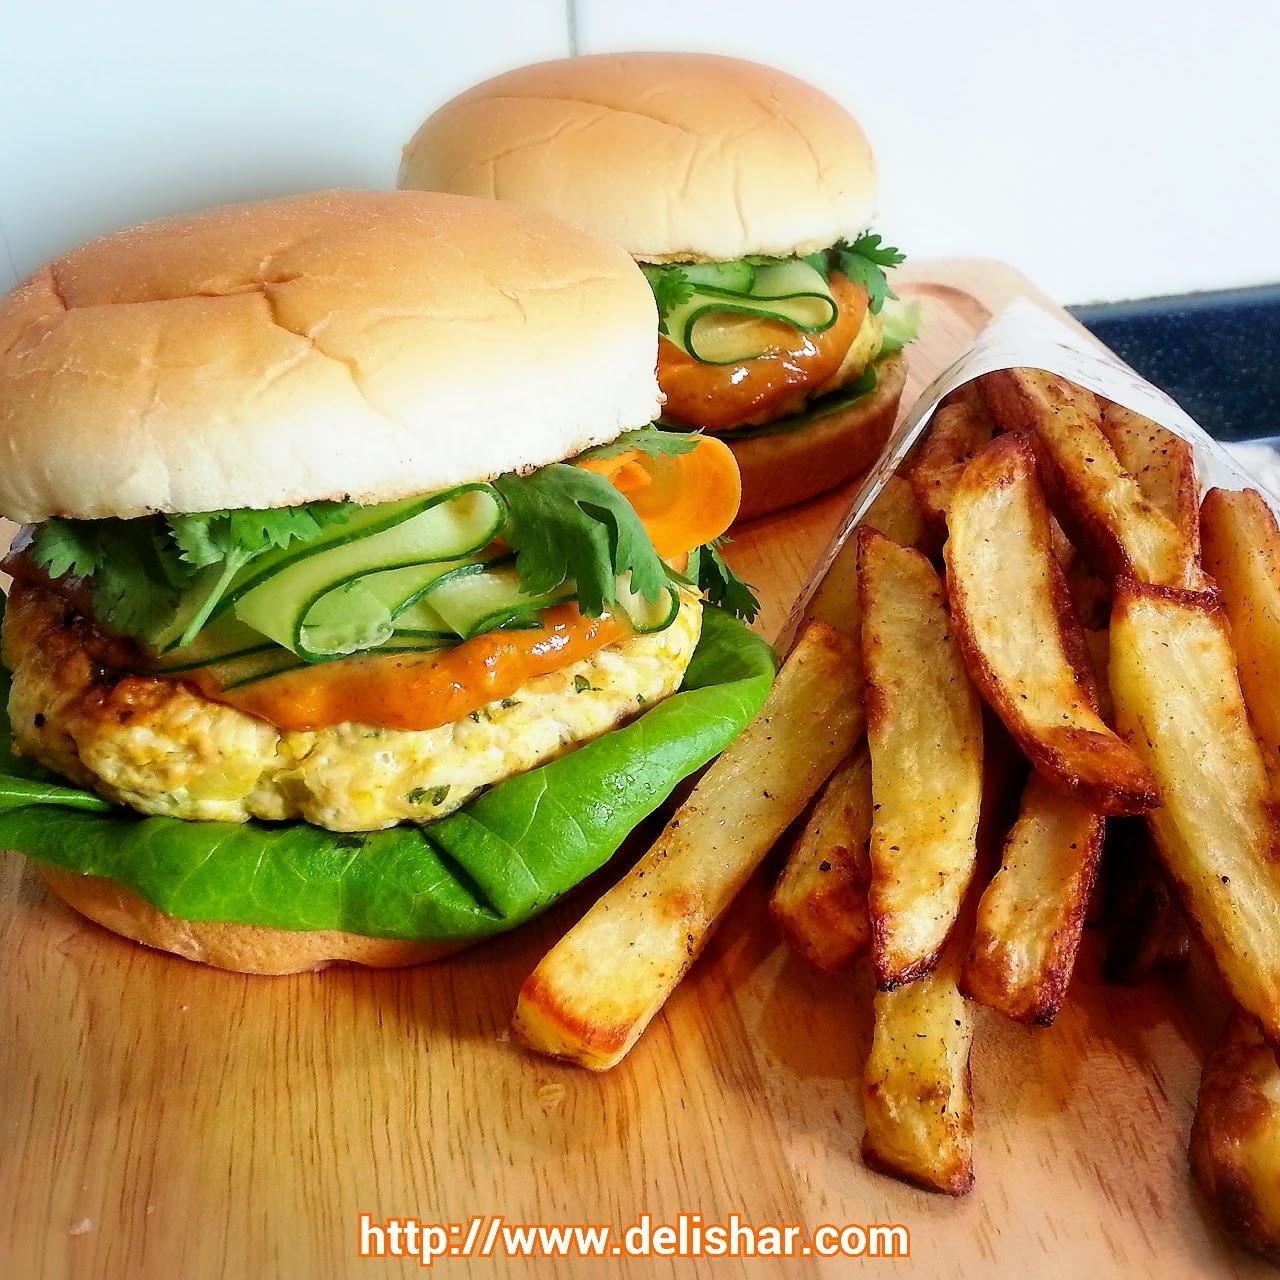 DELISHAR: Satay Chicken Burger with Spicy Peanut Sauce